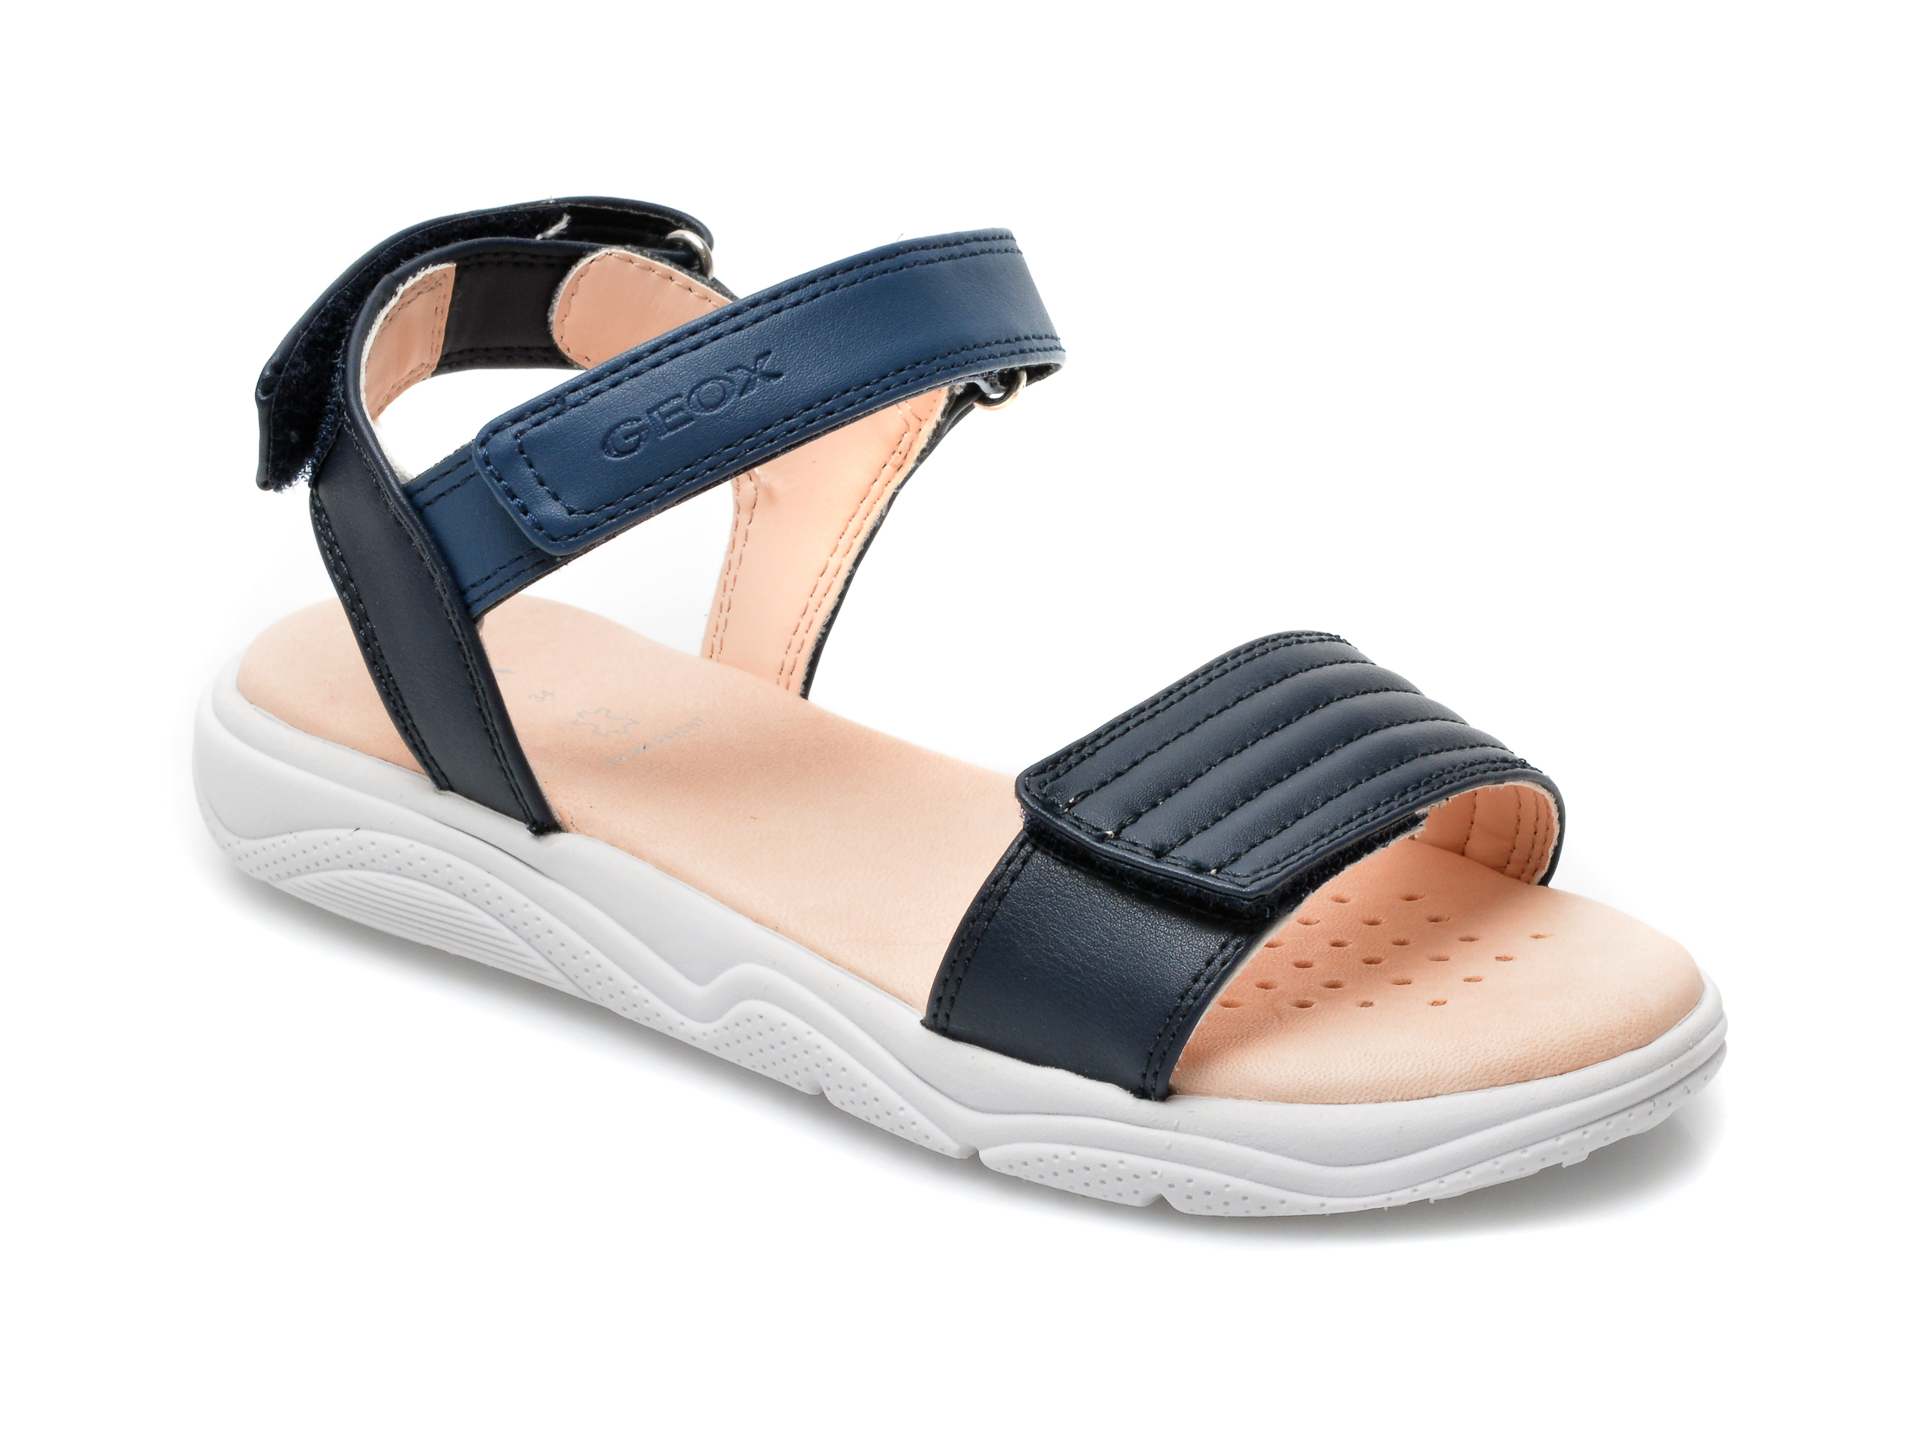 Sandale GEOX bleumarin, J15DUJ, din piele ecologica